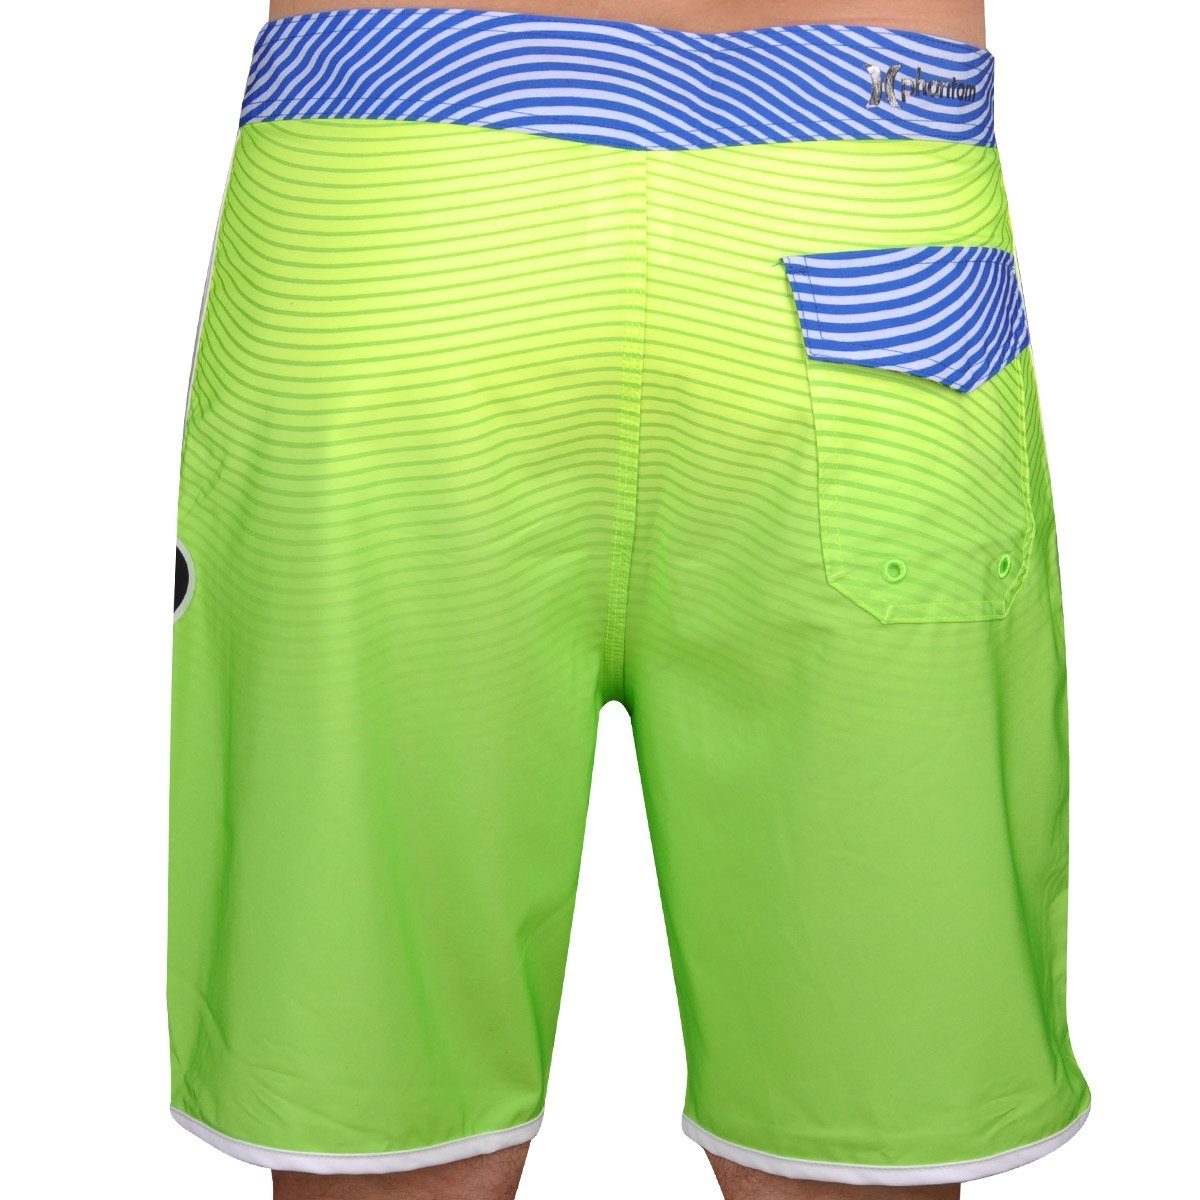 Bermuda Hurley Phantom Brasil Rio 2016 - Compre Agora  42d91d73b22